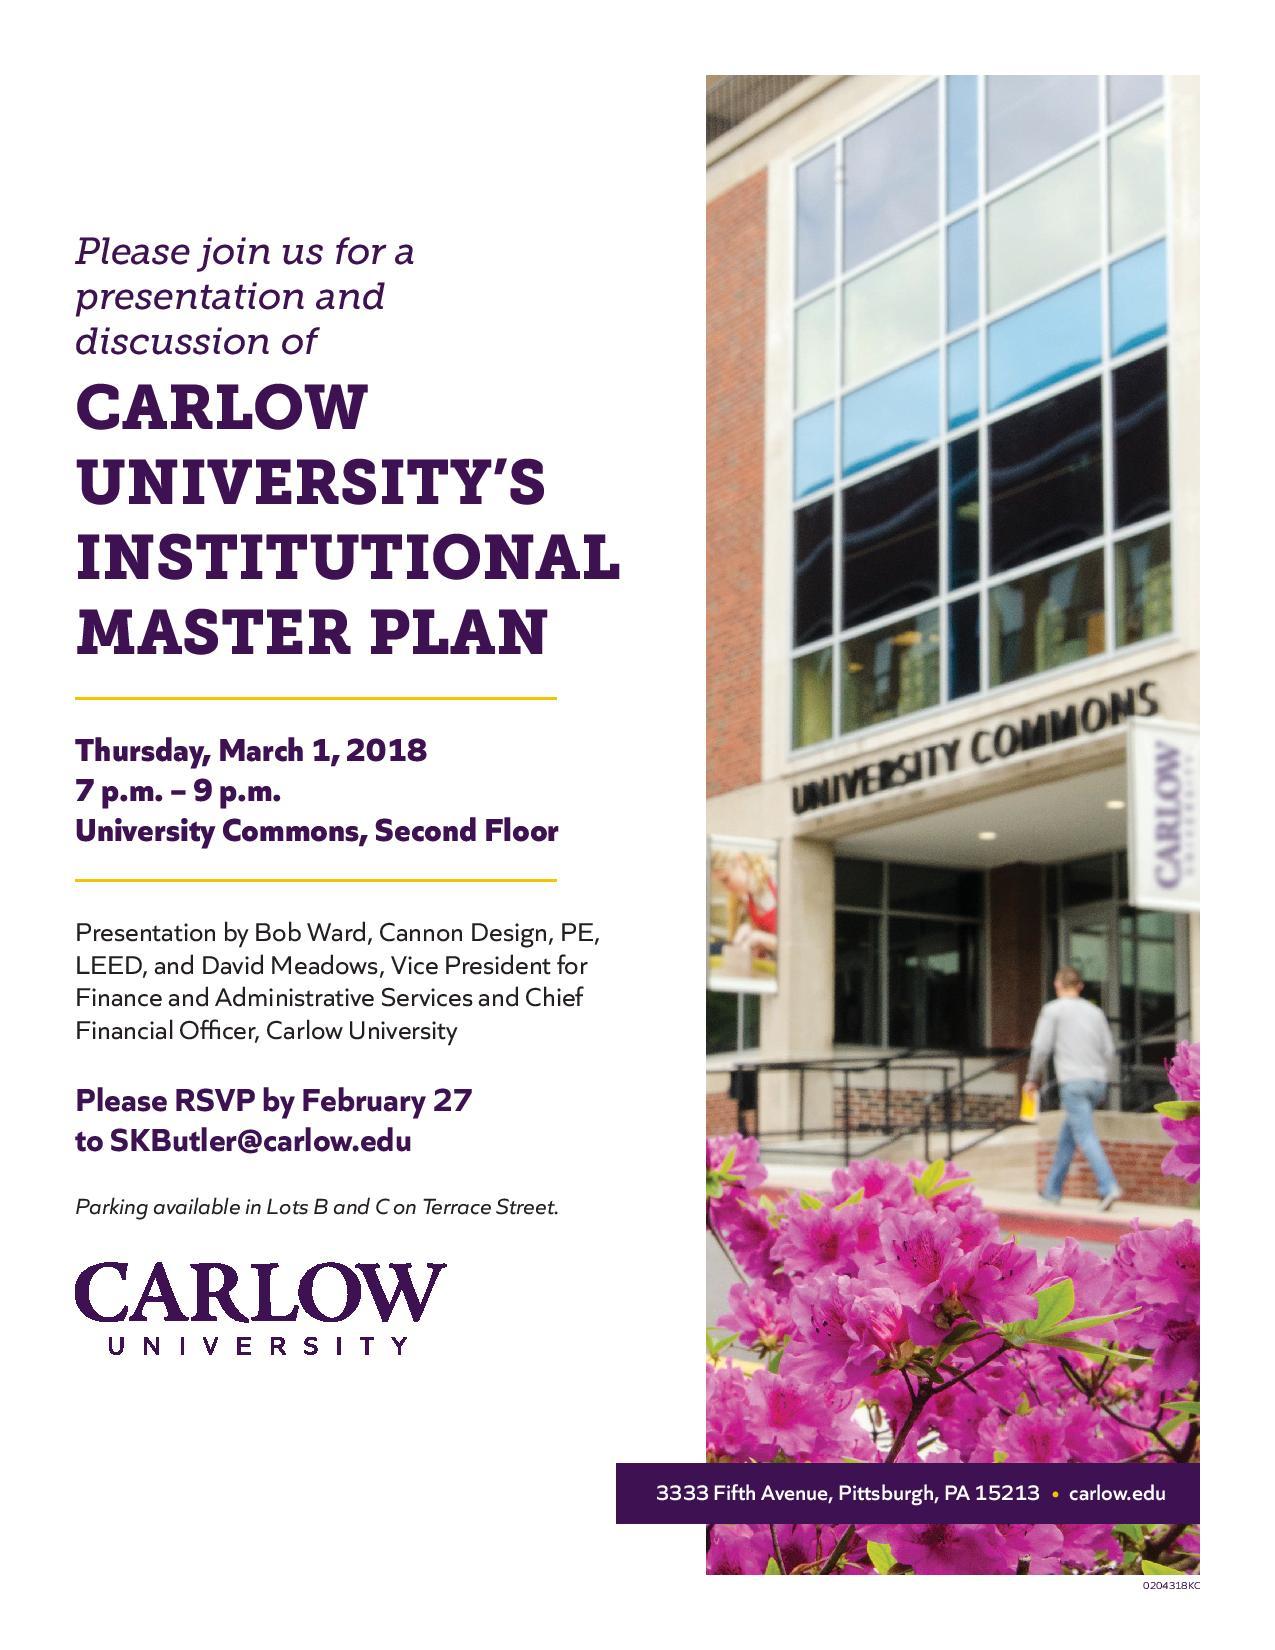 0204318KC_PRES_Master Plan Community Meeting-Presentation Flyer March 20...-page-001.jpg